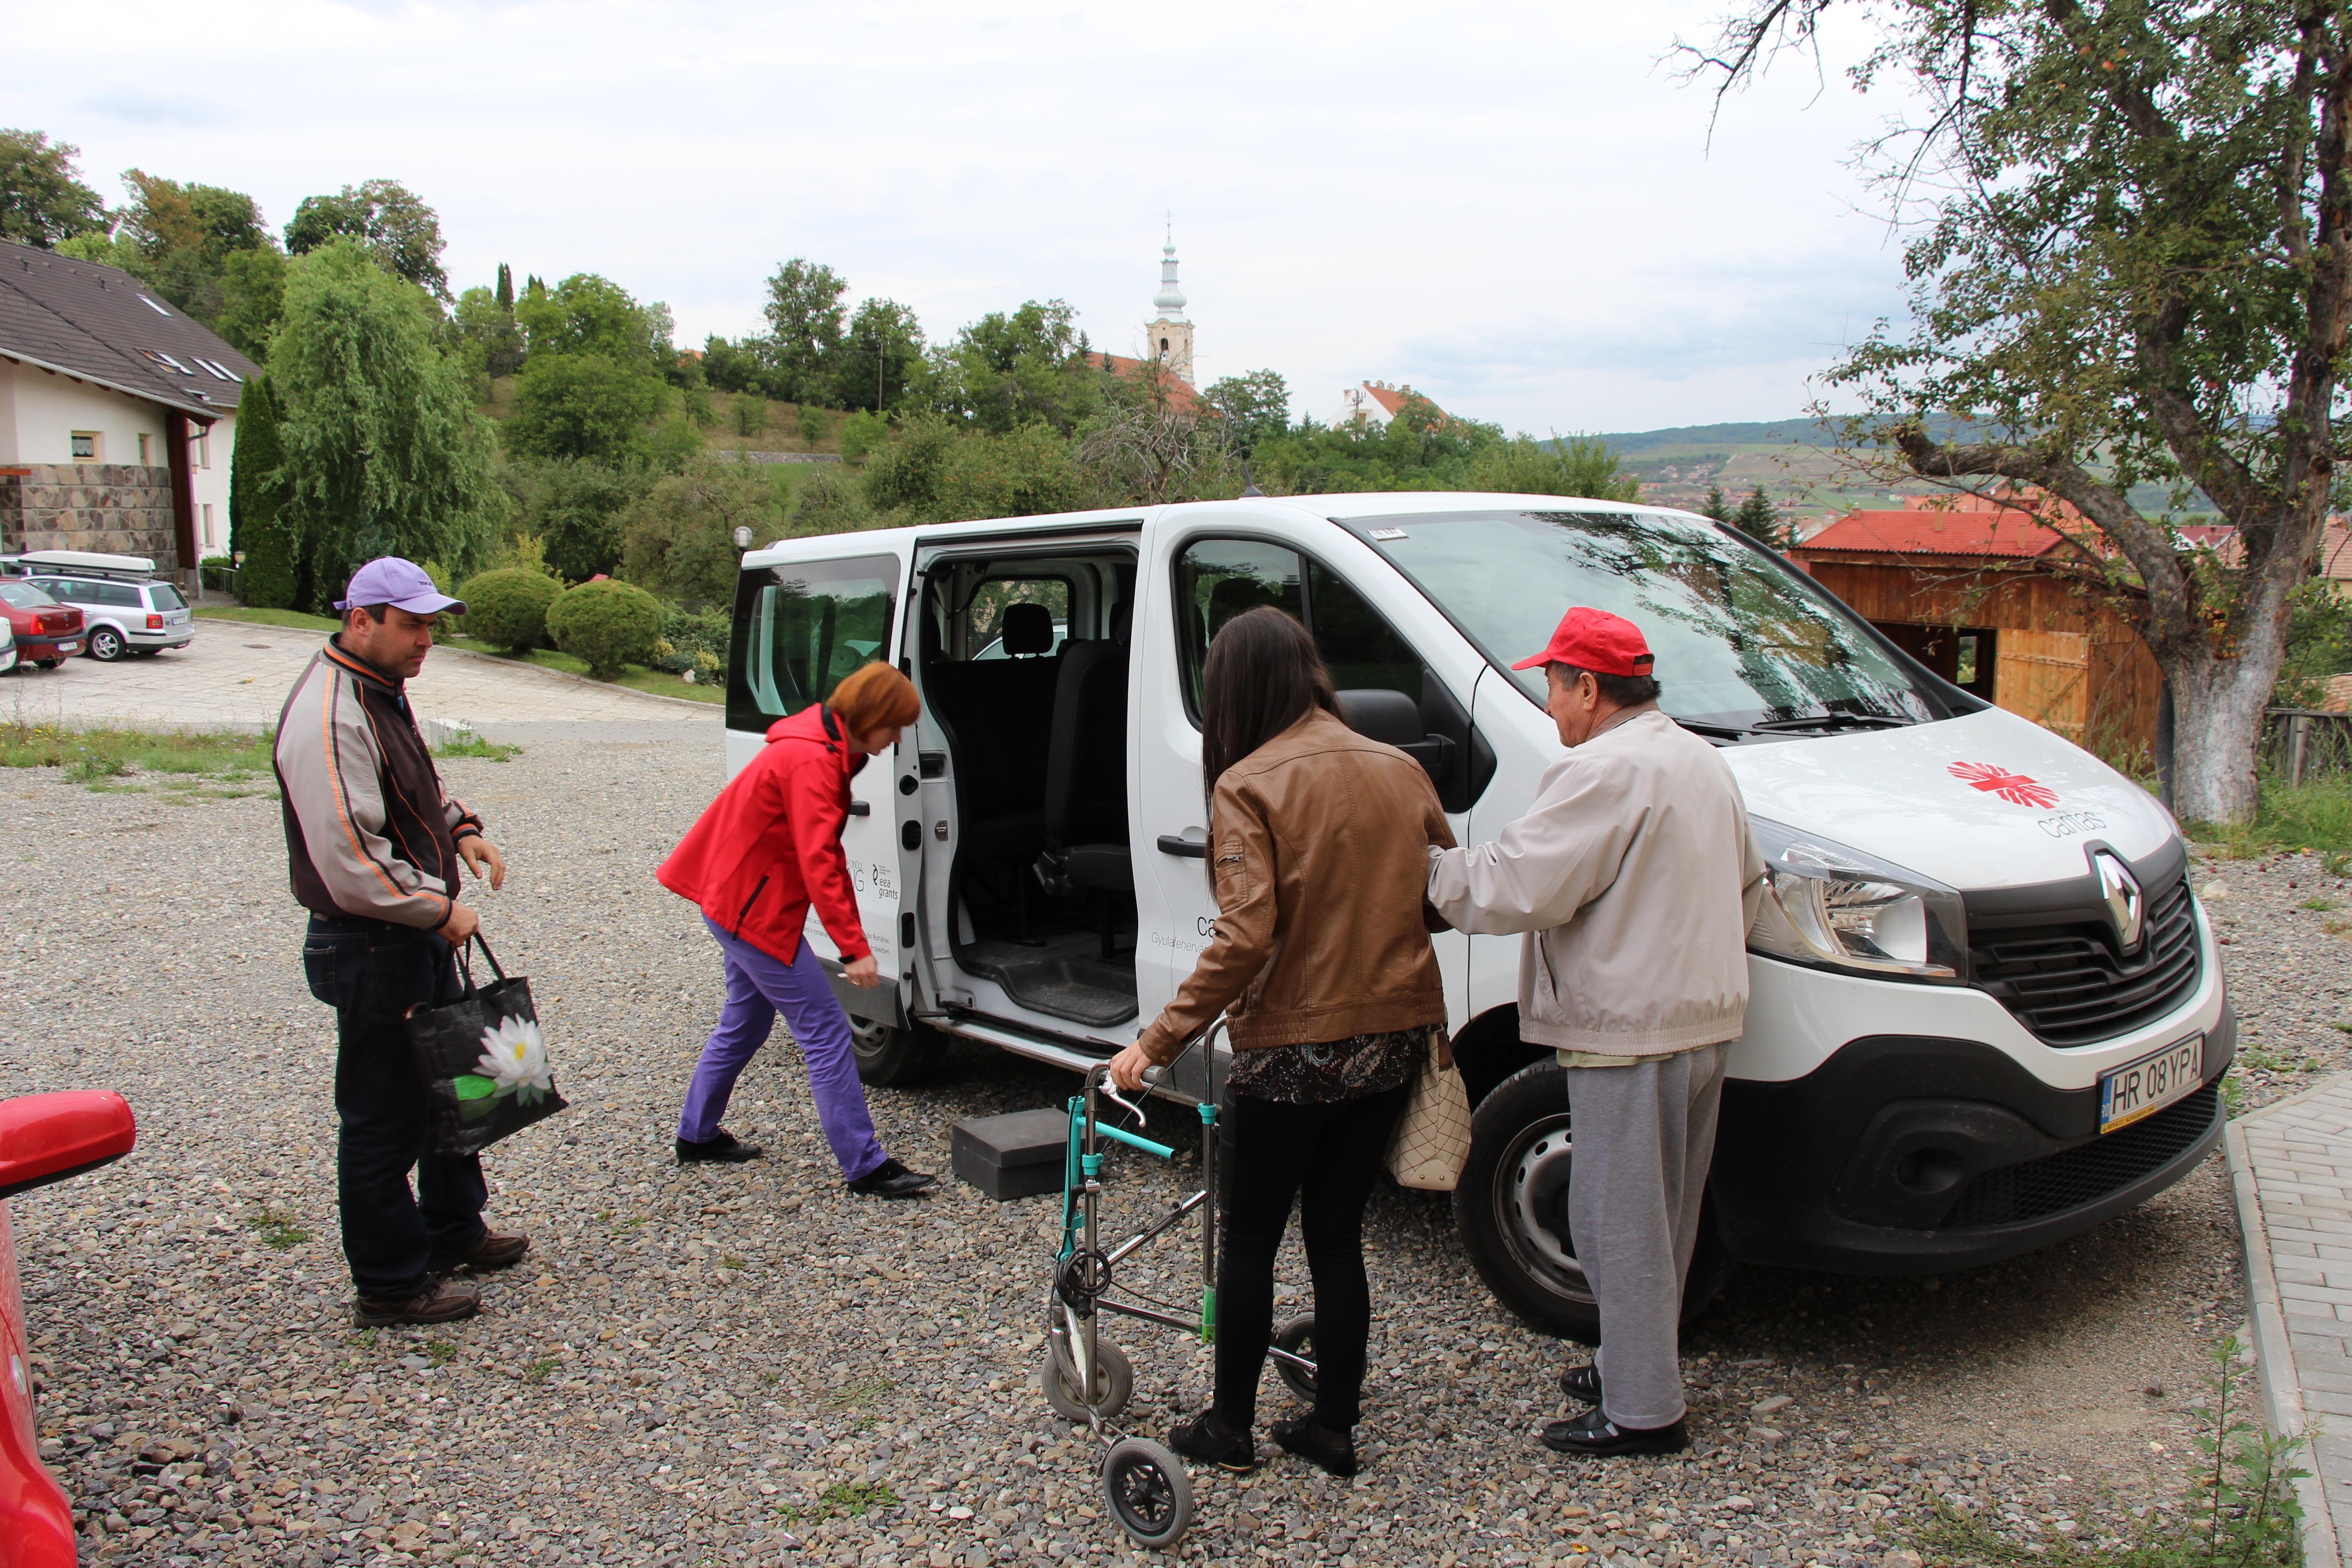 Dezvoltam retele interregionale pentru acces crescut la servicii sociale in Romania